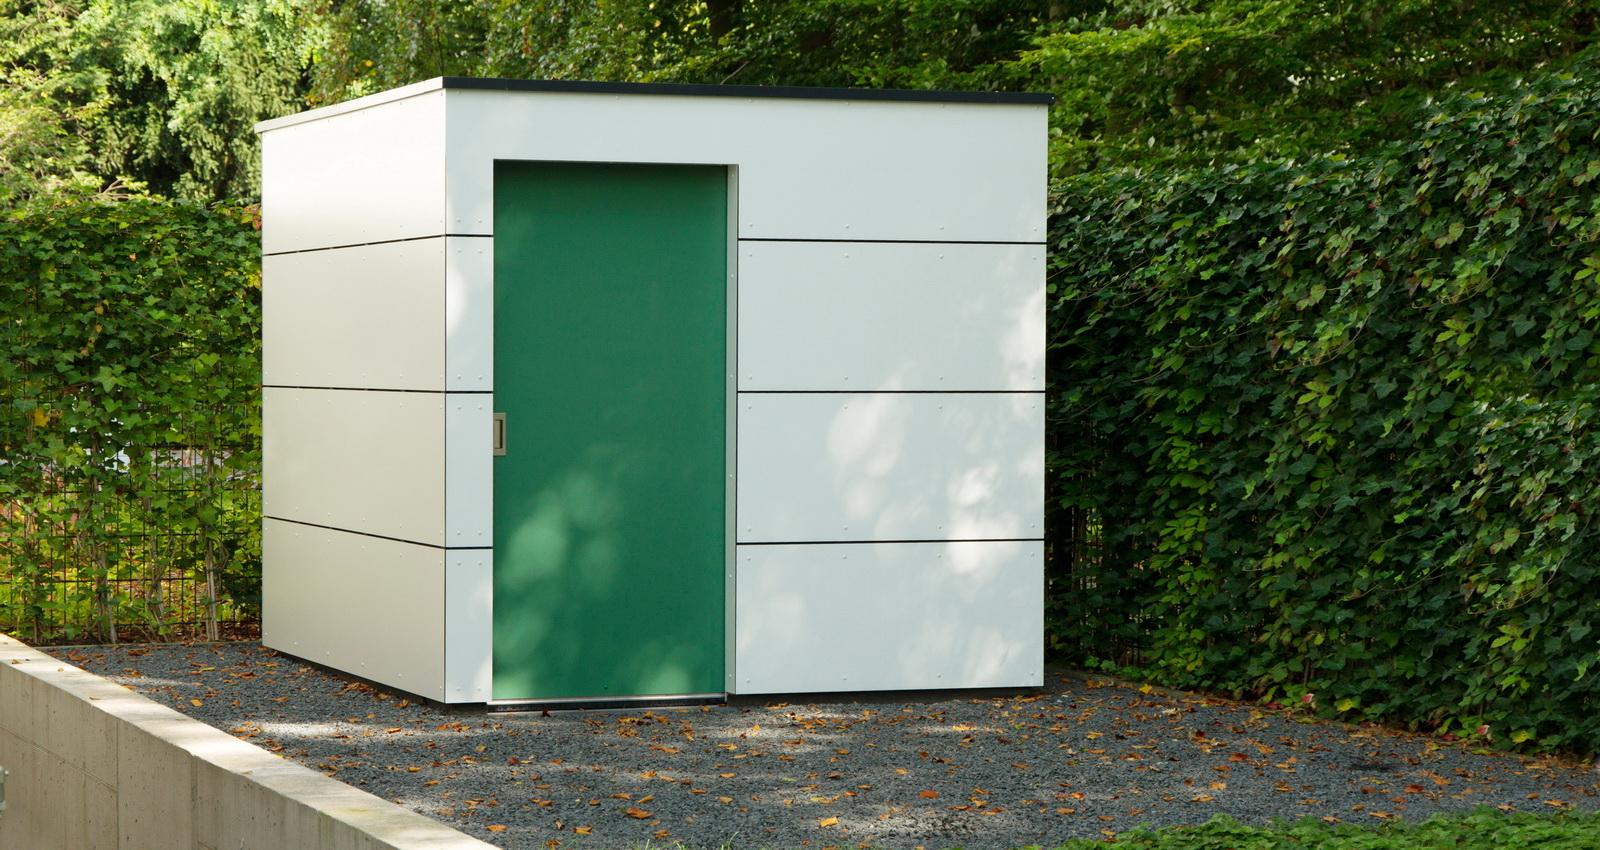 Design Gartenhaus moderne Gartenhäuser schicke Gartensauna auch